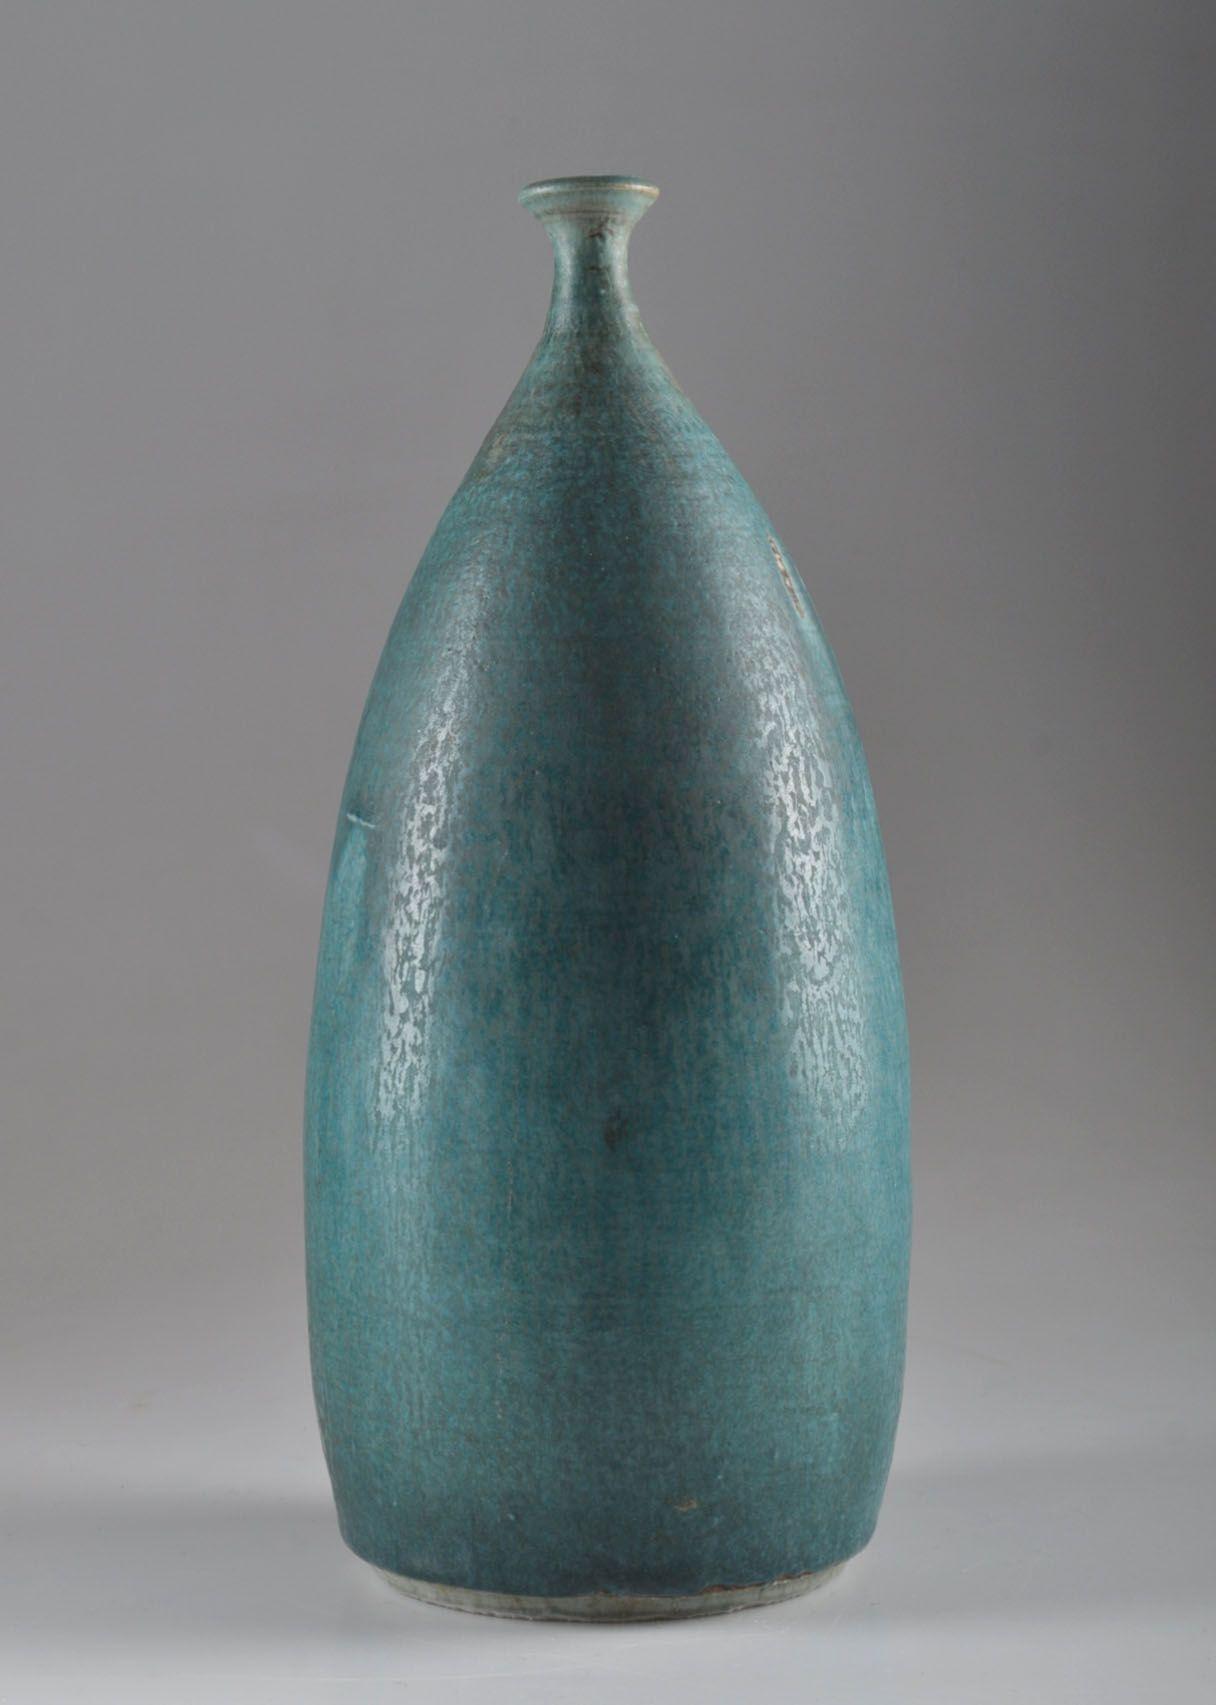 Kyllikki salmenhaara arabia unique glazed stoneware vase hare ceramic vessel from finland unique stoneware vase with hares fur glaze reviewsmspy